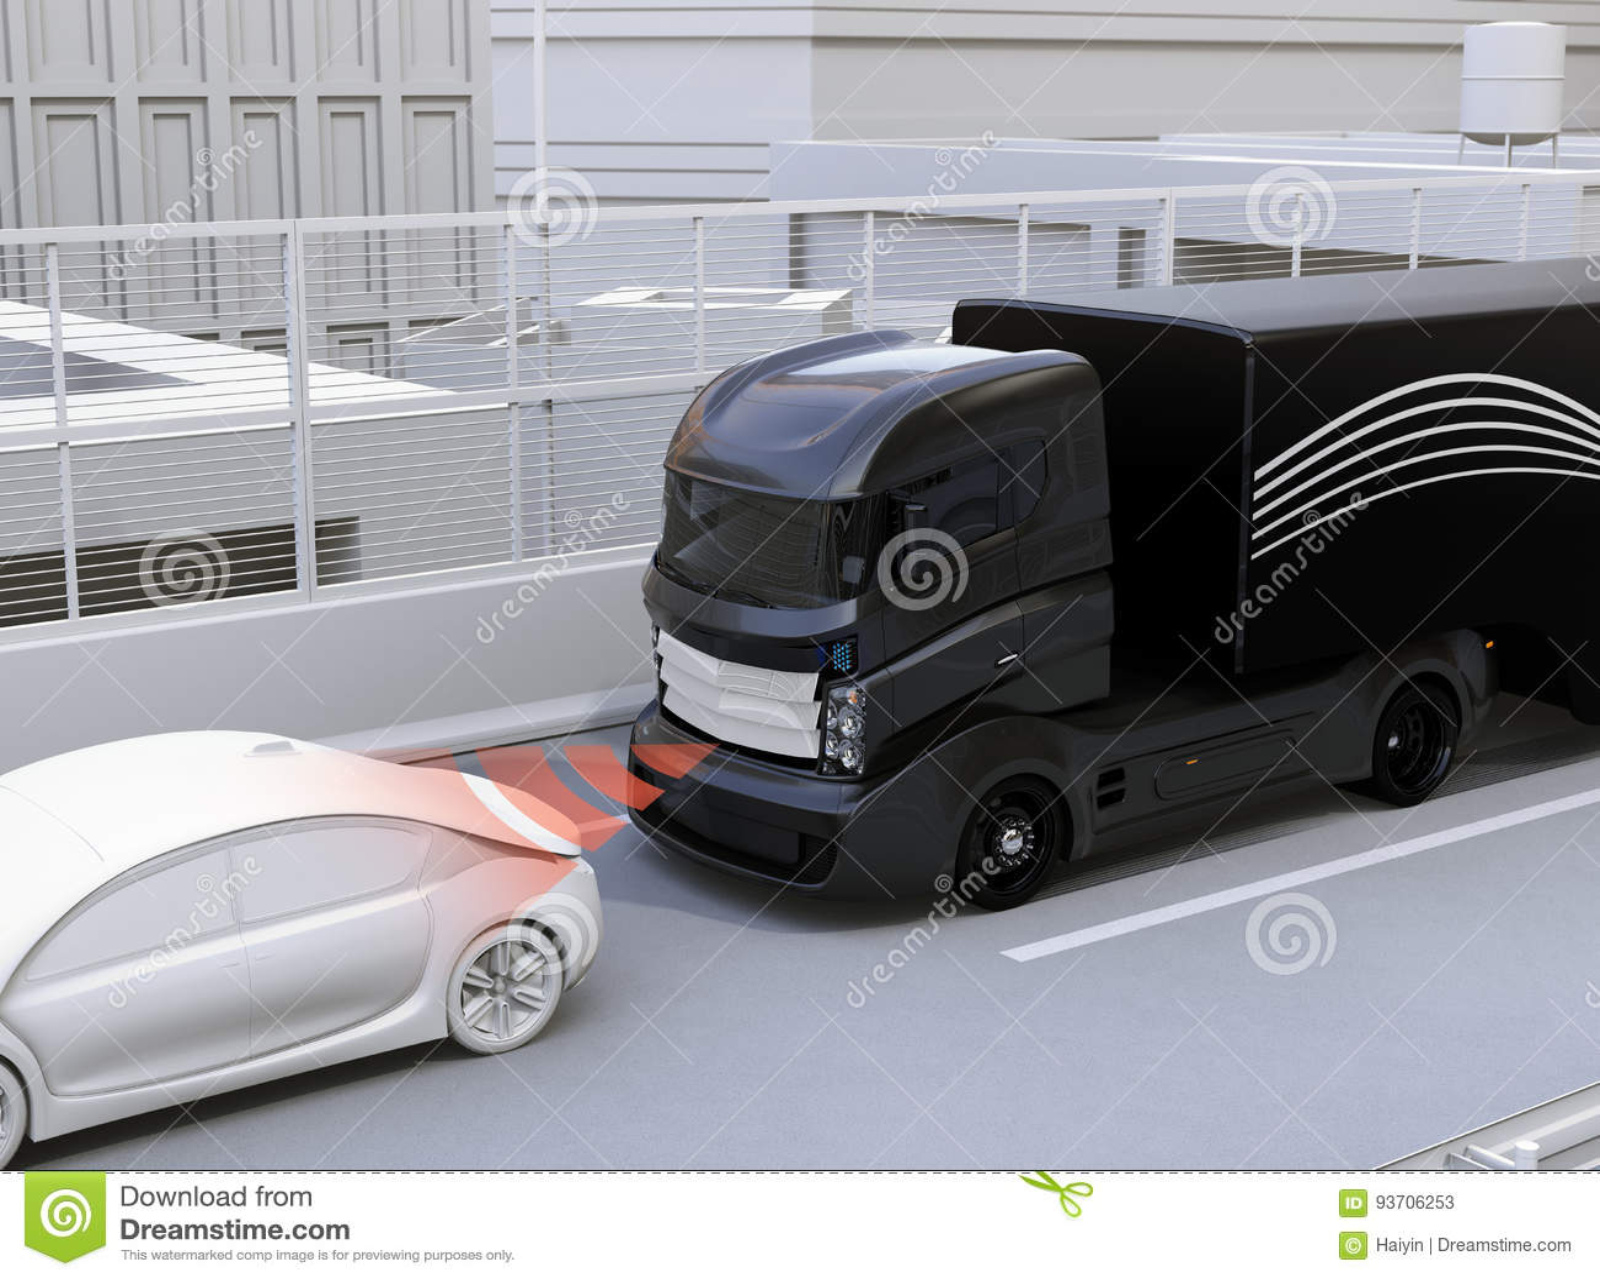 car braking cartoons illustrations vector stock images. Black Bedroom Furniture Sets. Home Design Ideas